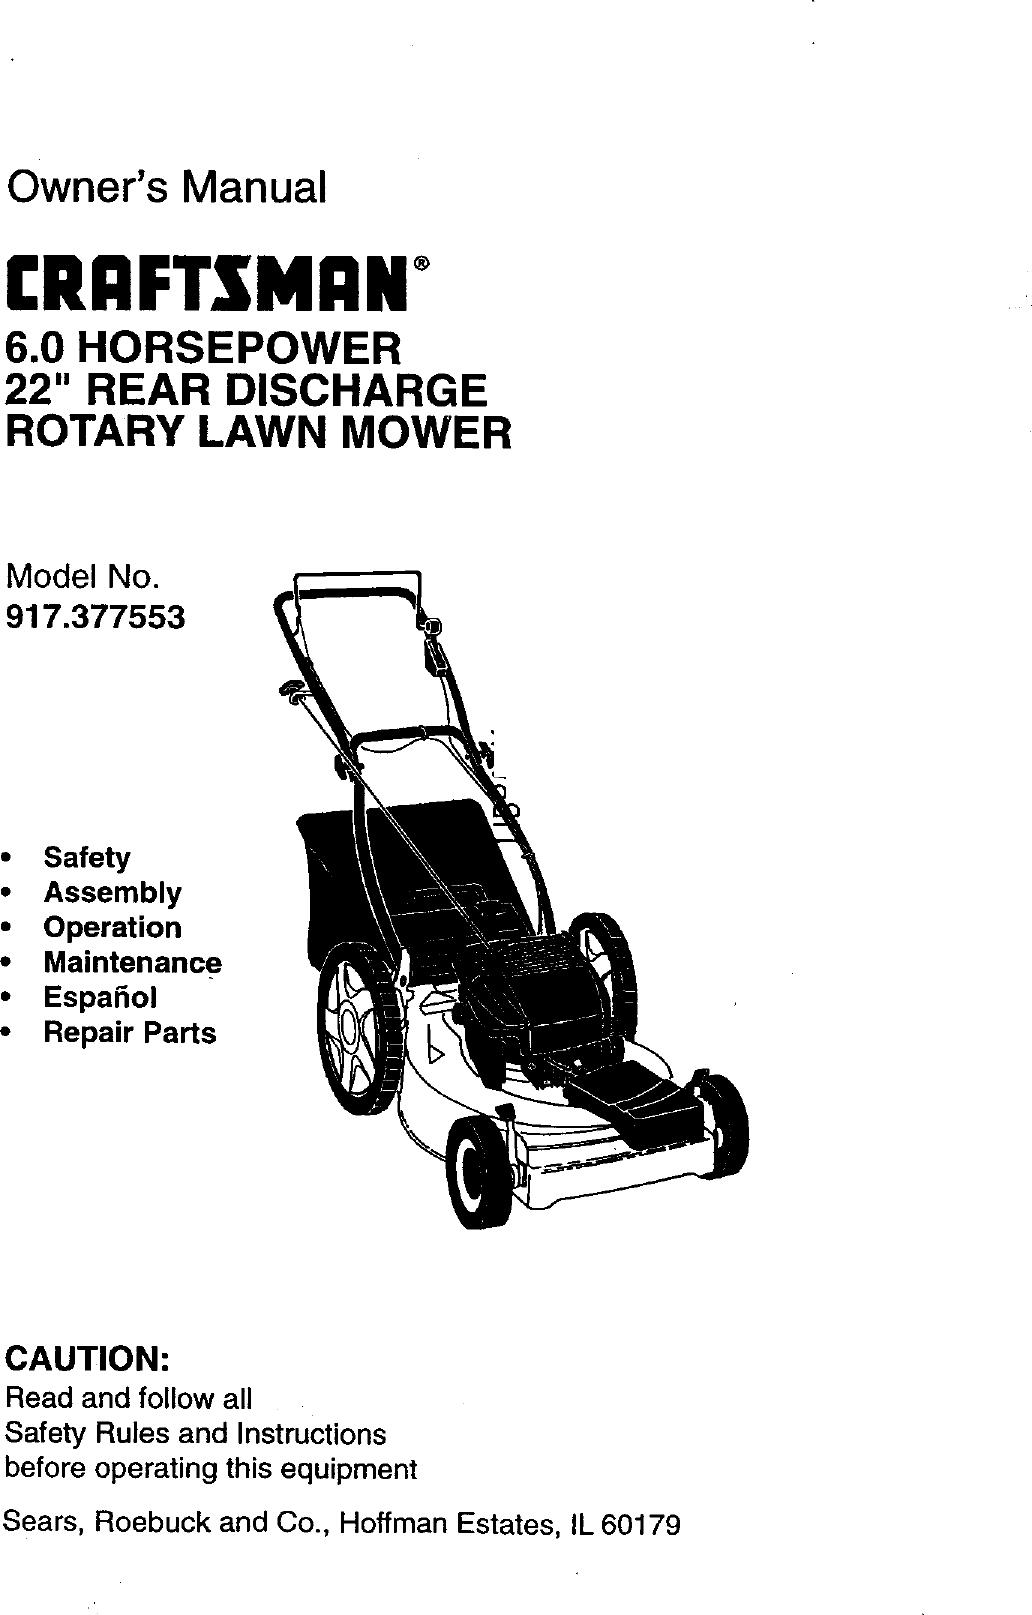 Craftsman 917377553 User Manual ROTARY MOWER Manuals And